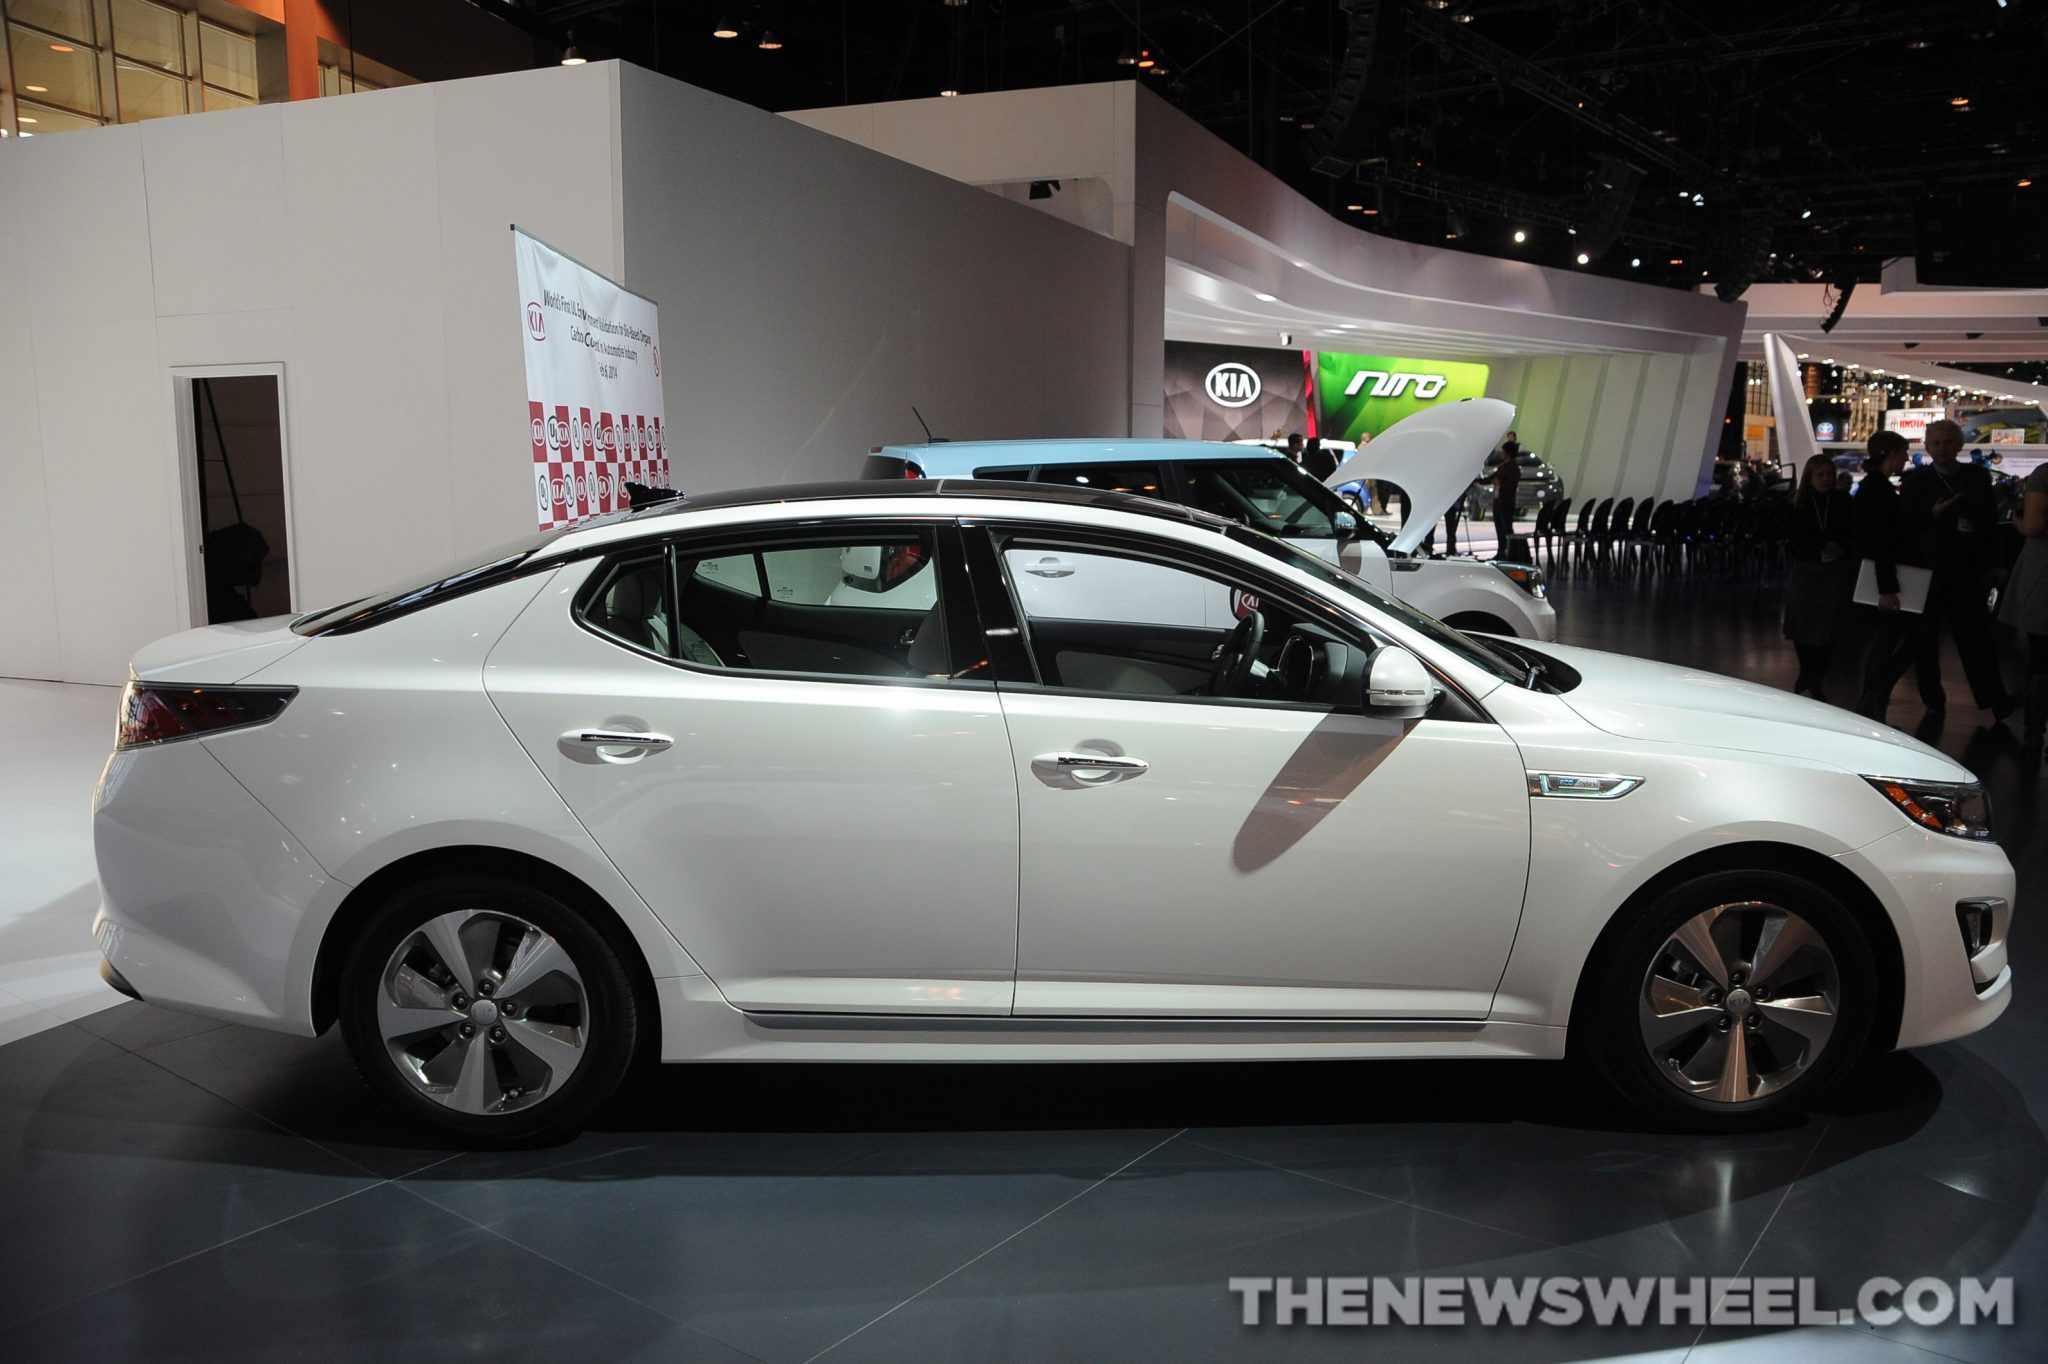 2017 Kia Optima Hybrid Overview